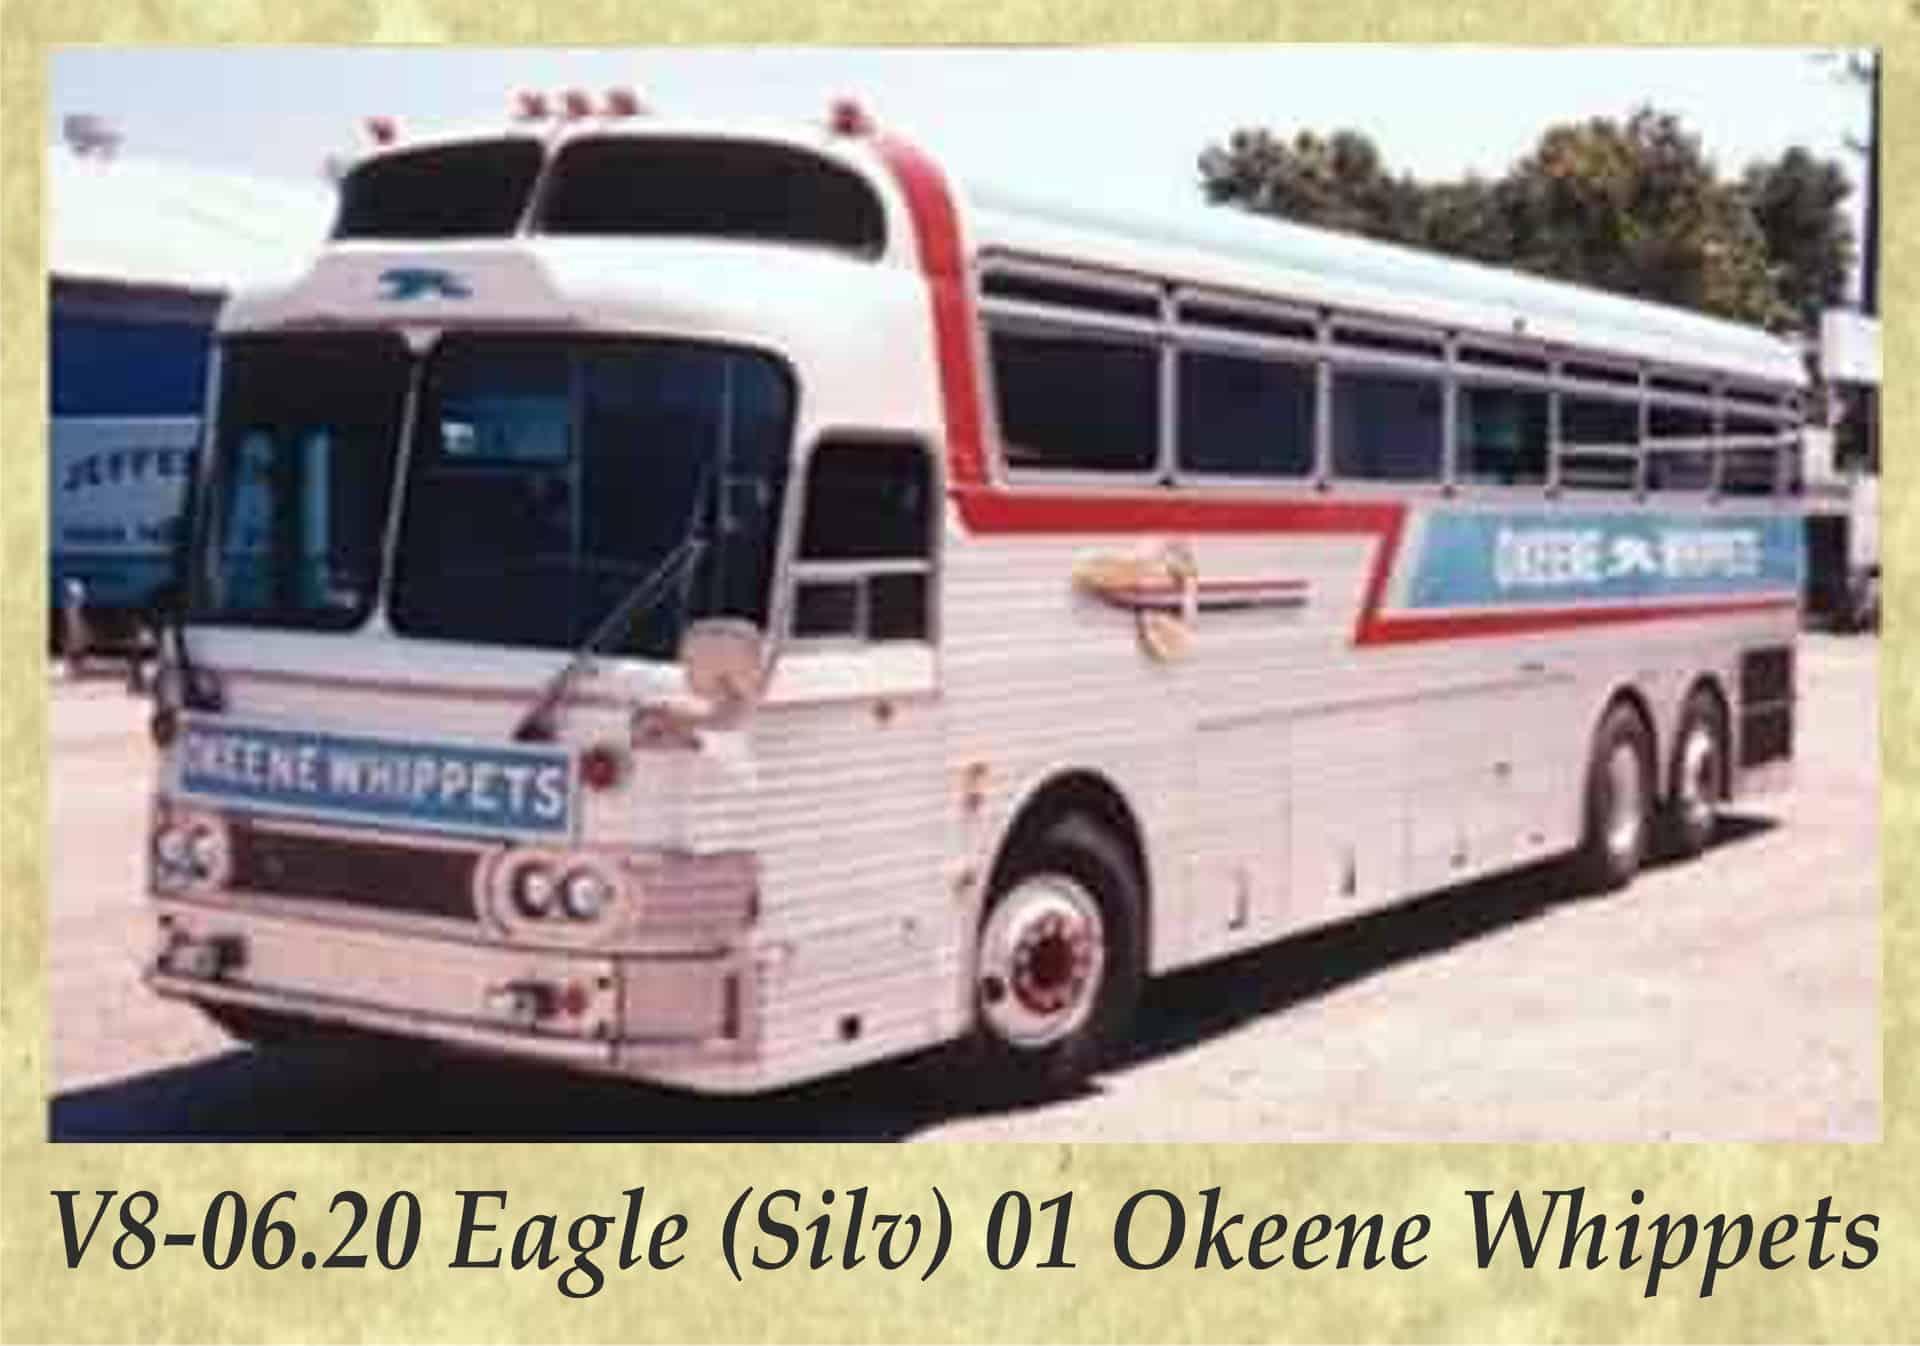 V8-06.20 Eagle (Silv) 01 Okeene Whippets